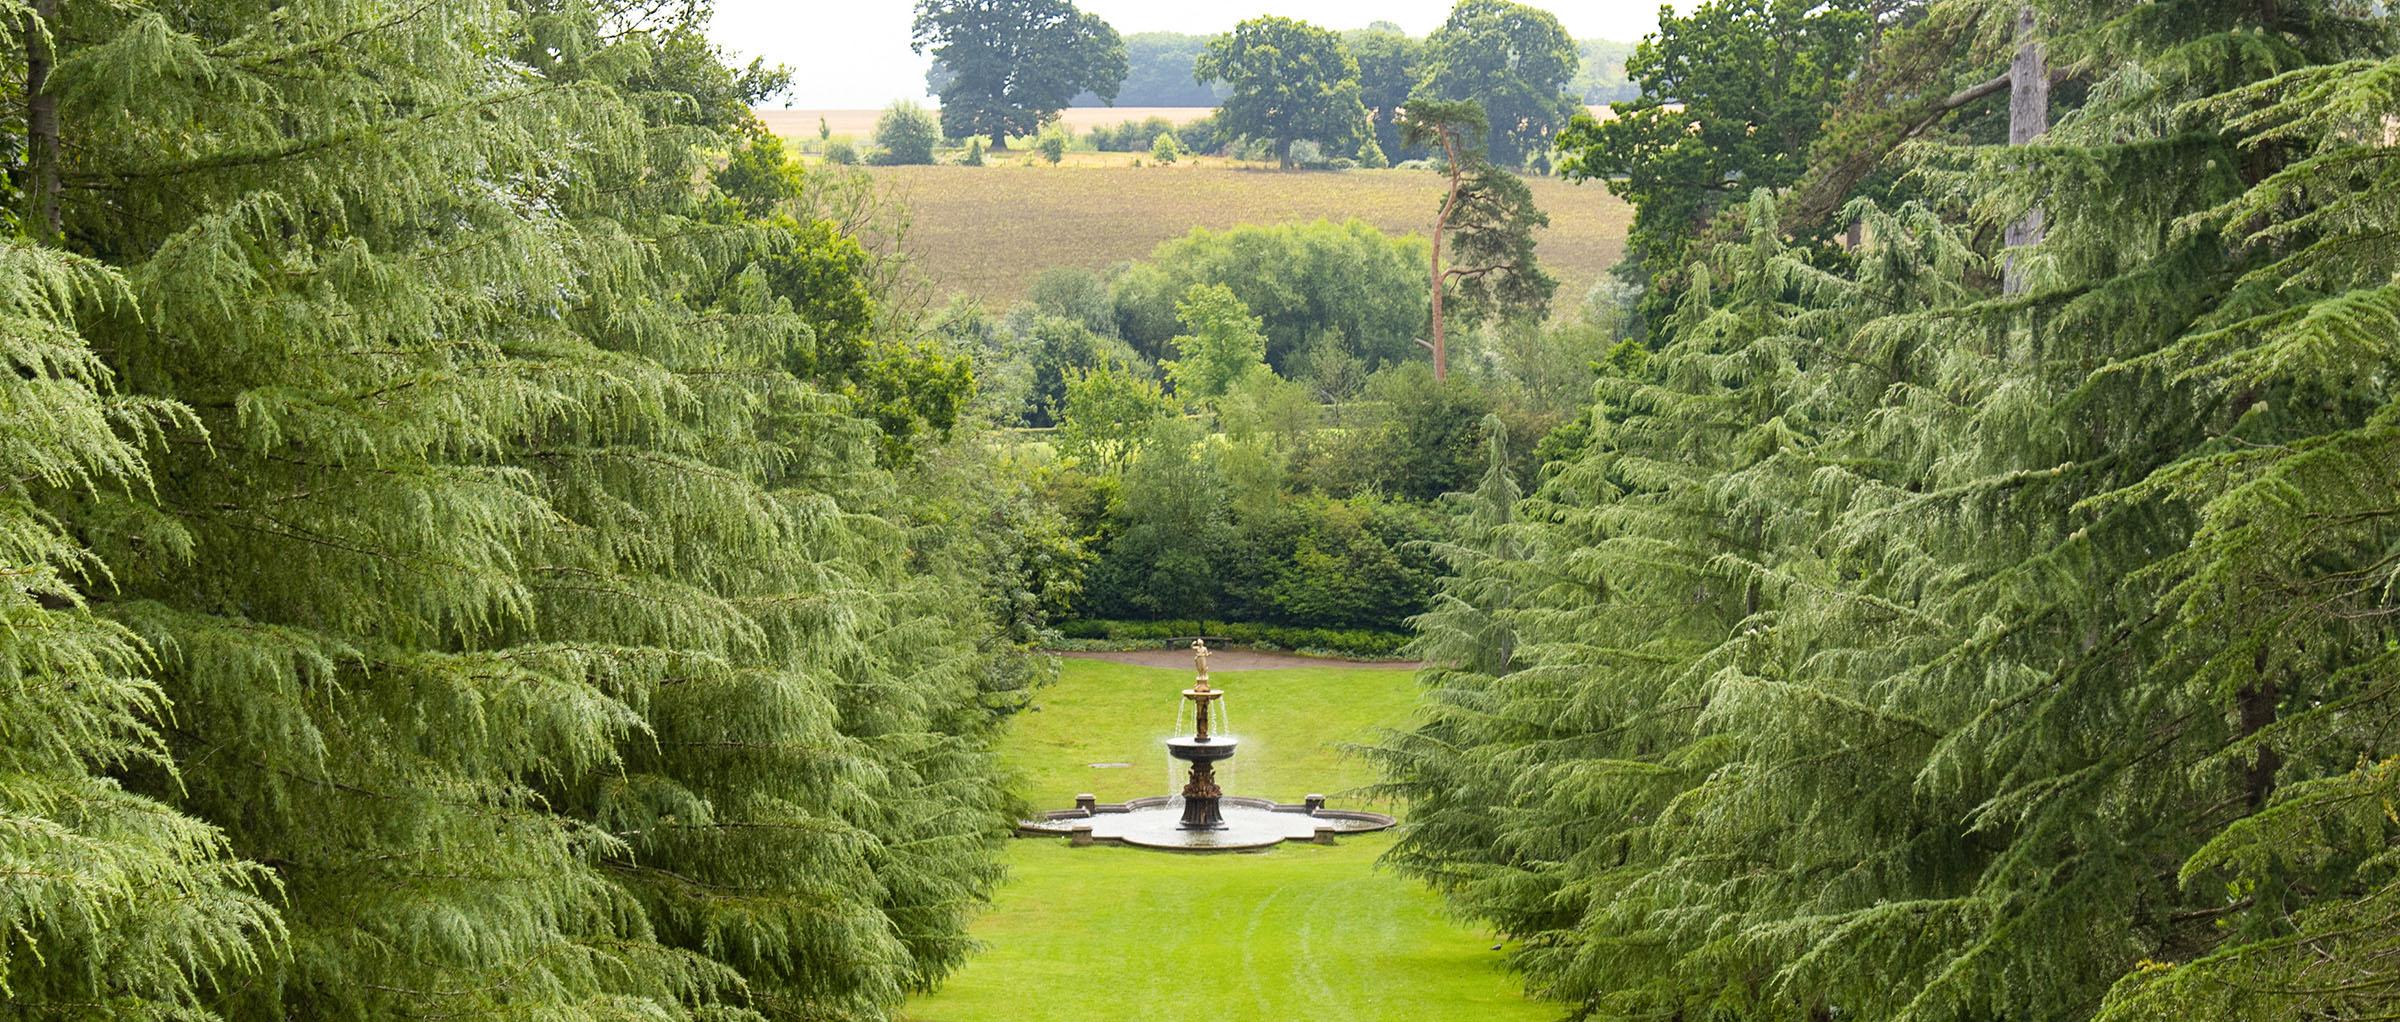 Fountain in Dunorlan Park